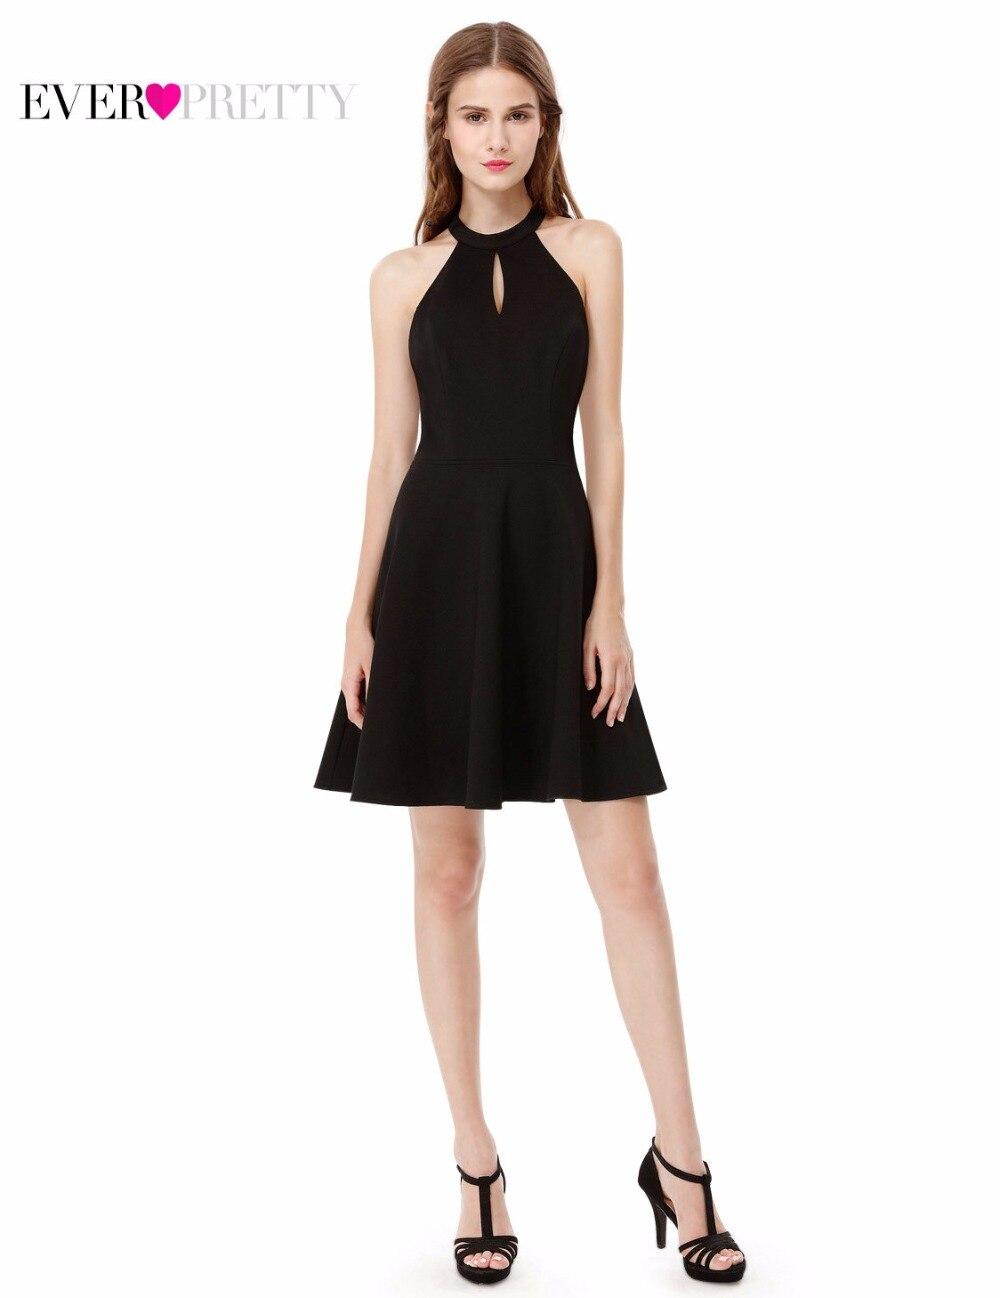 New Arrival 2018 Cocktail Dresses Cotton Empire Halter Mini Party Dresses Ever Pretty AS05587 Black Cocktail Dress